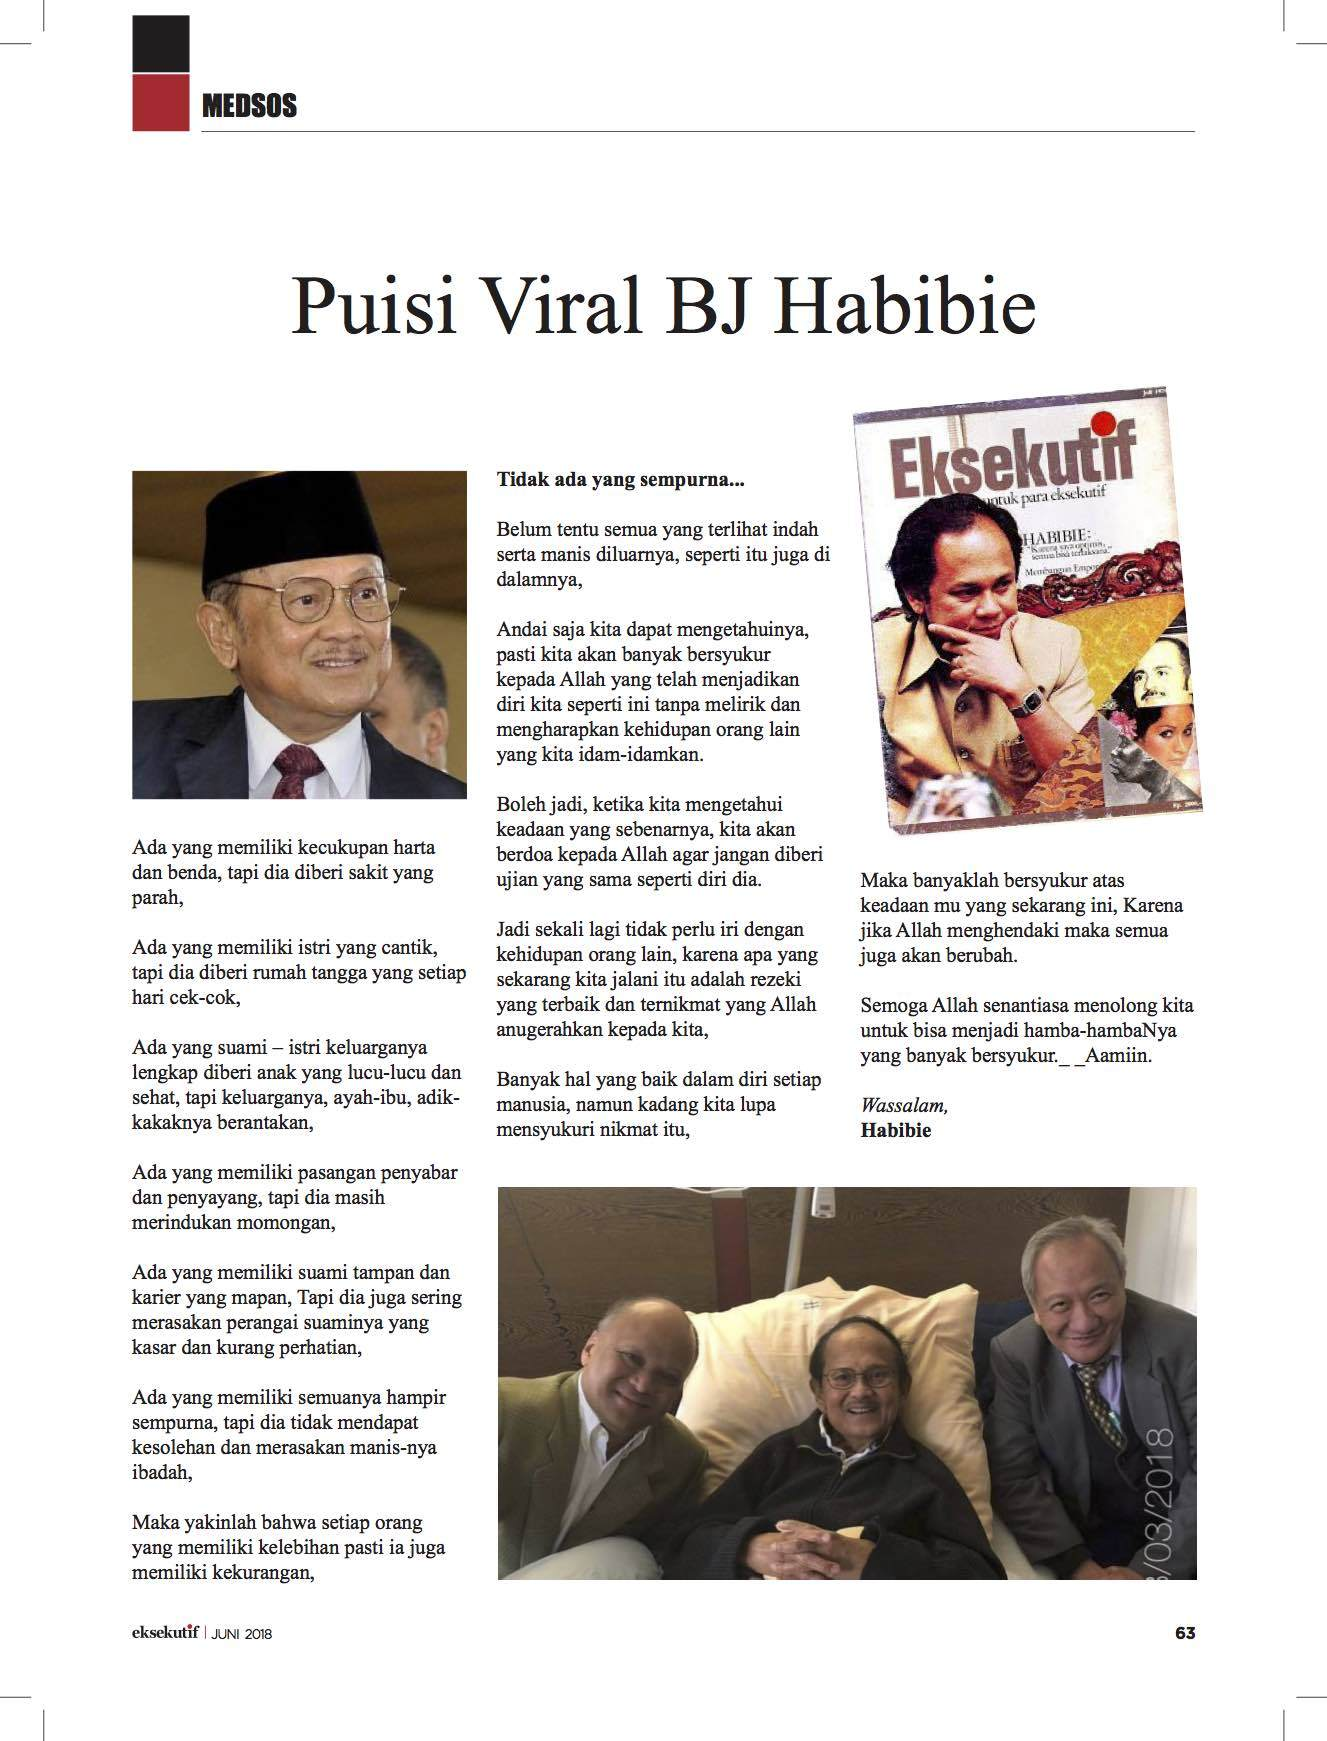 Presiden Jokowi Kembali Jenguk Habibie di RSPAD Senin Ini